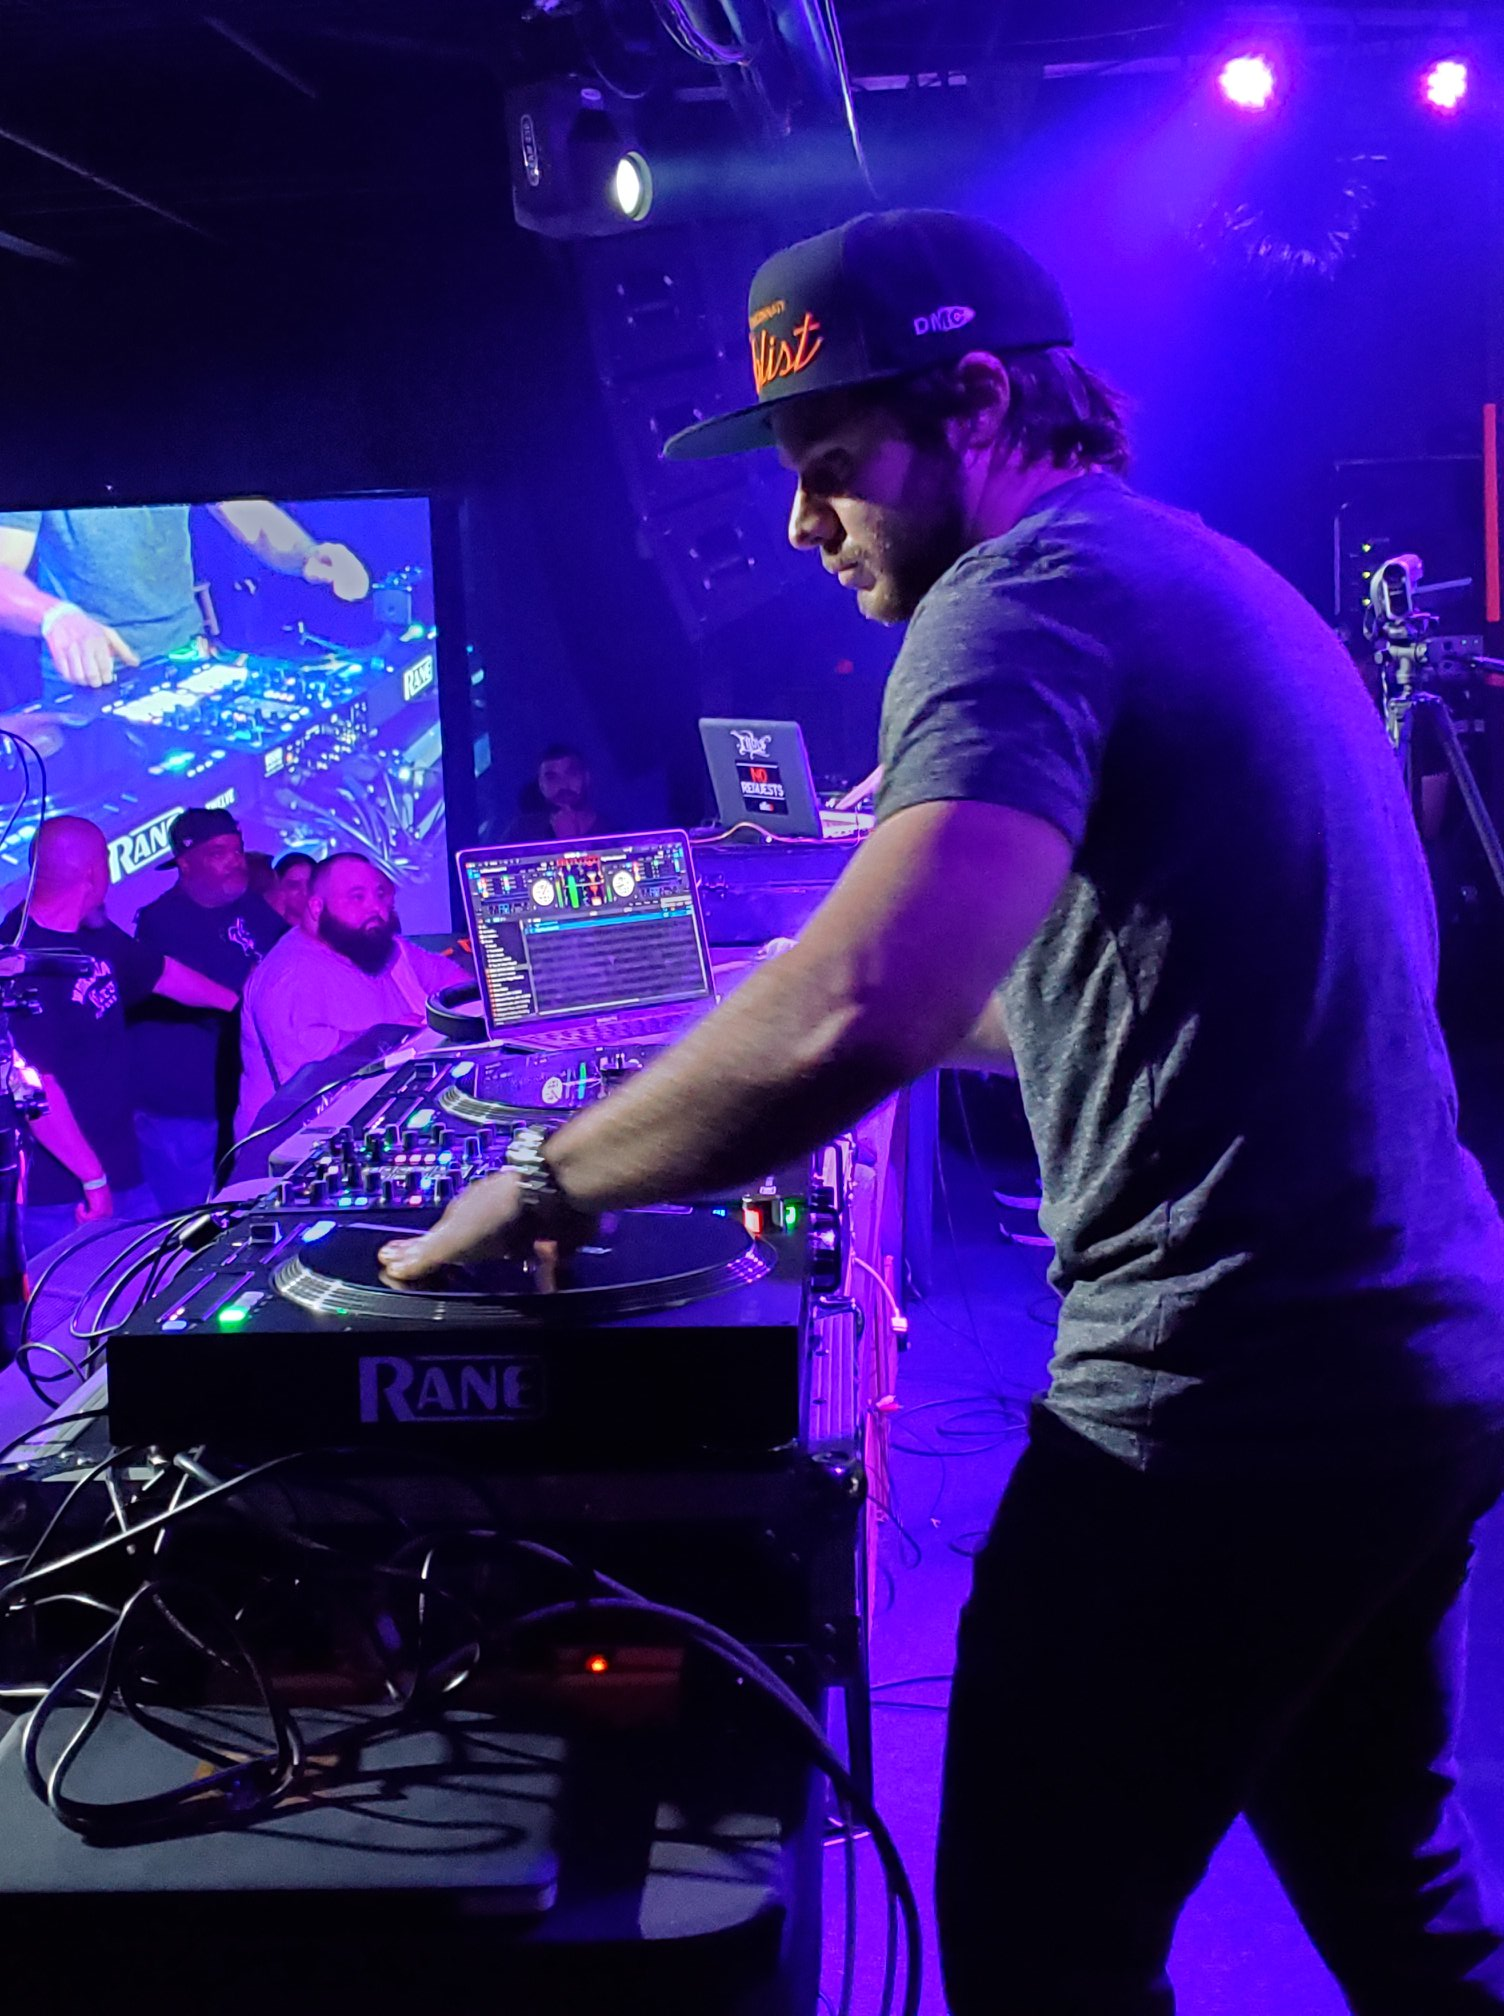 Creative DJ Mixing